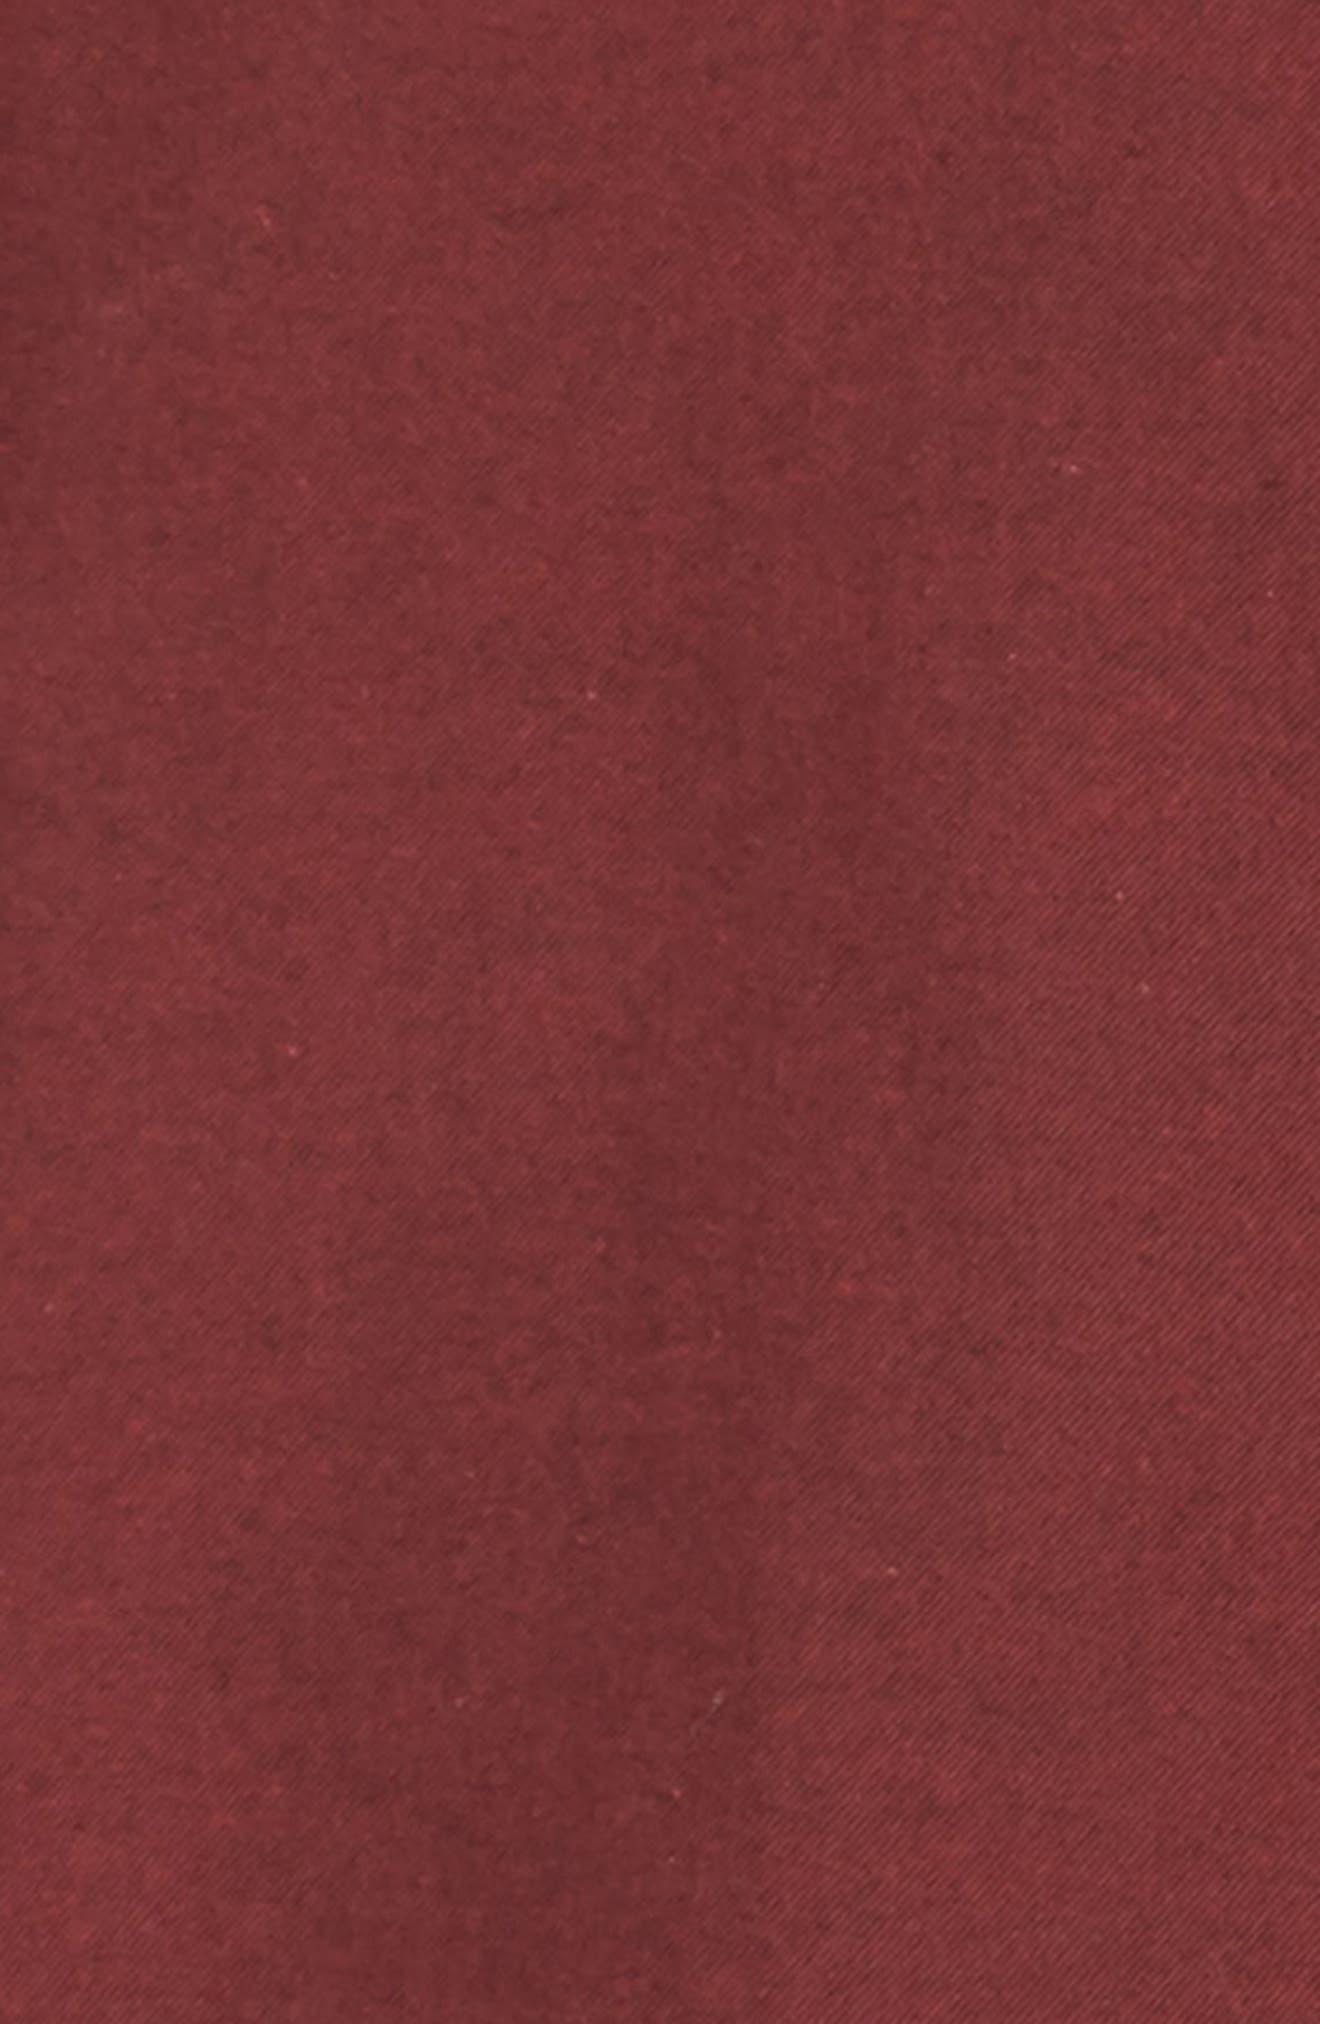 NORDSTROM MEN'S SHOP,                             Slim Fit Brushed Twill Sport Shirt,                             Alternate thumbnail 6, color,                             RED JESTER BRUSHED TWILL